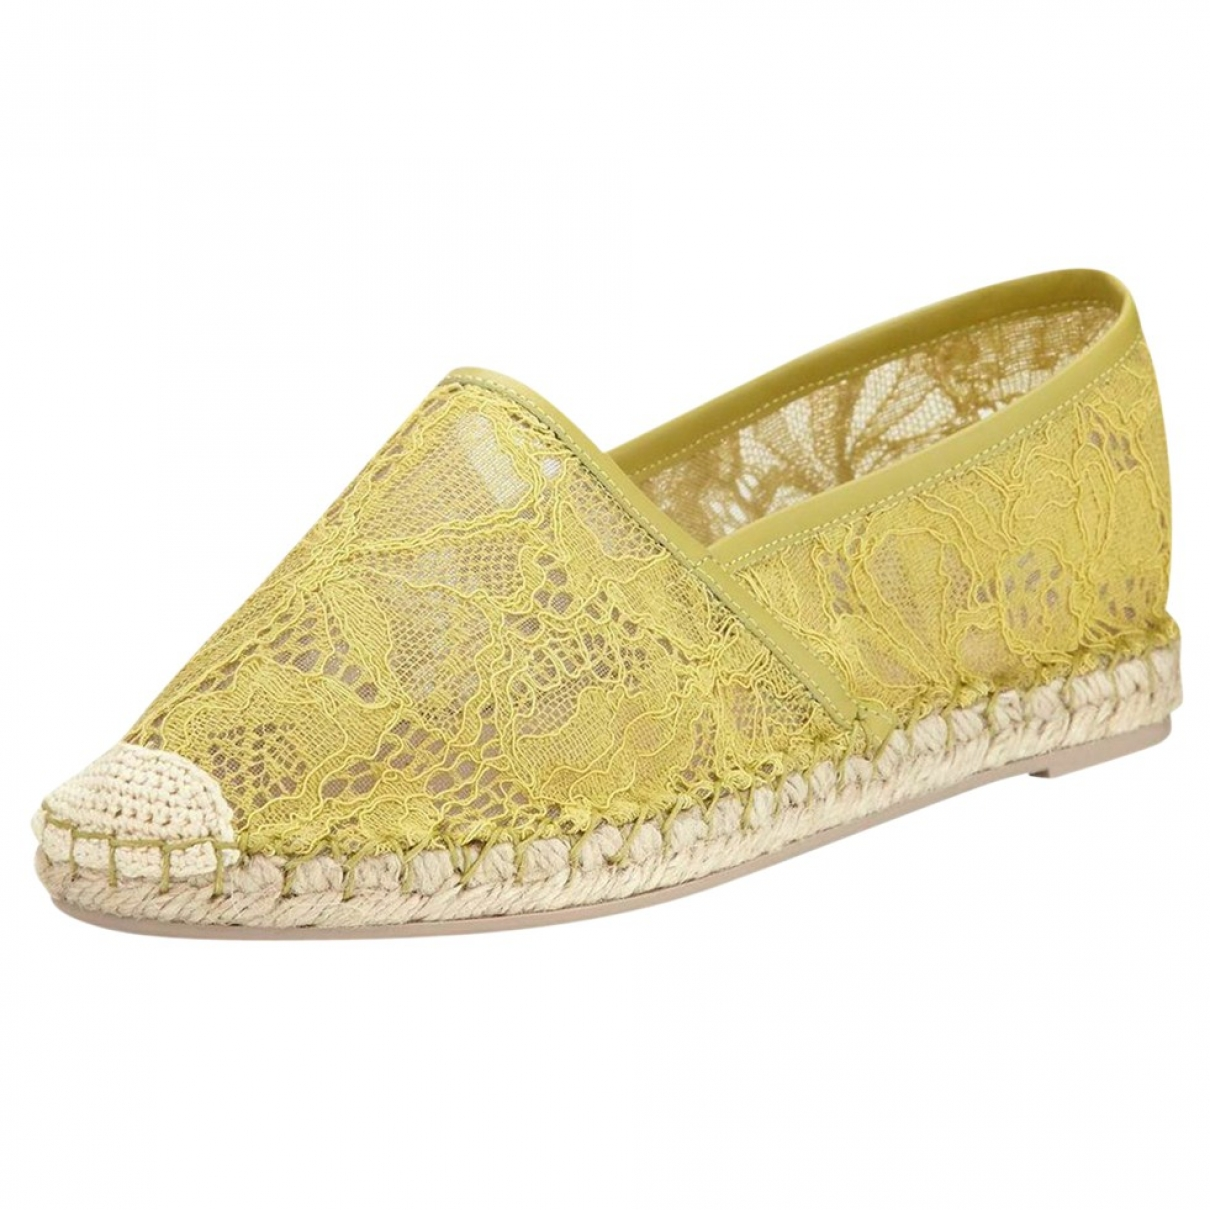 Valentino Garavani - Espadrilles   pour femme en toile - jaune